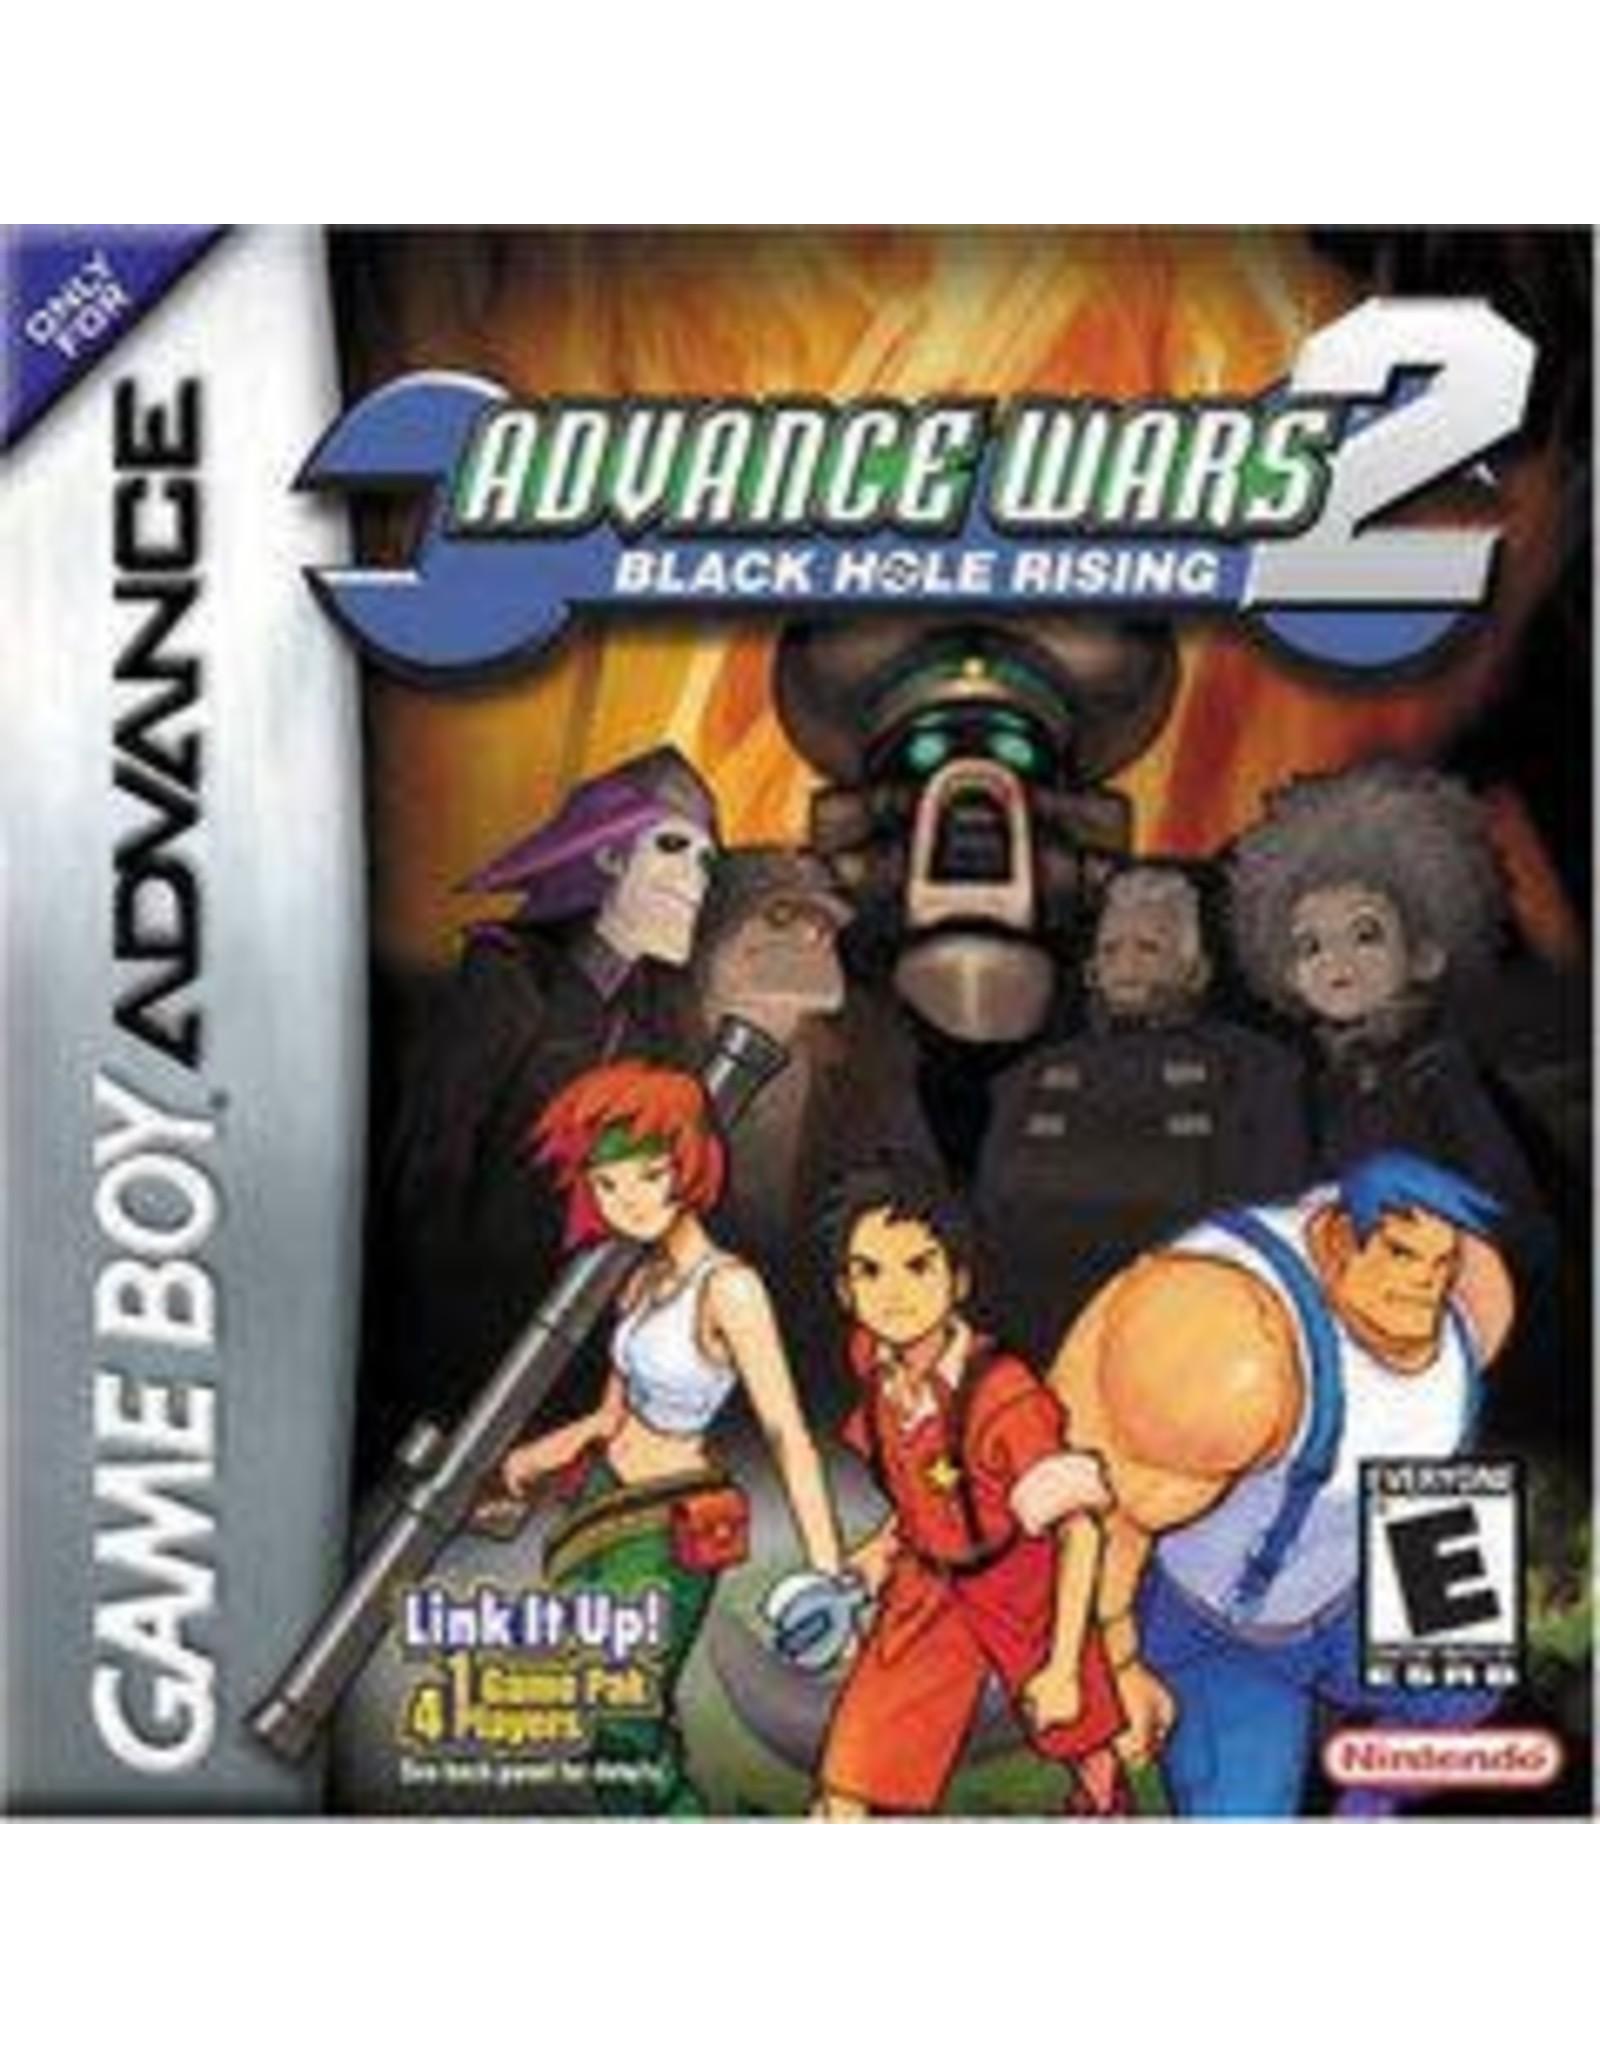 GameBoy Advance Advance Wars 2 Black Hole Rising (CiB, Minor Box Damage)